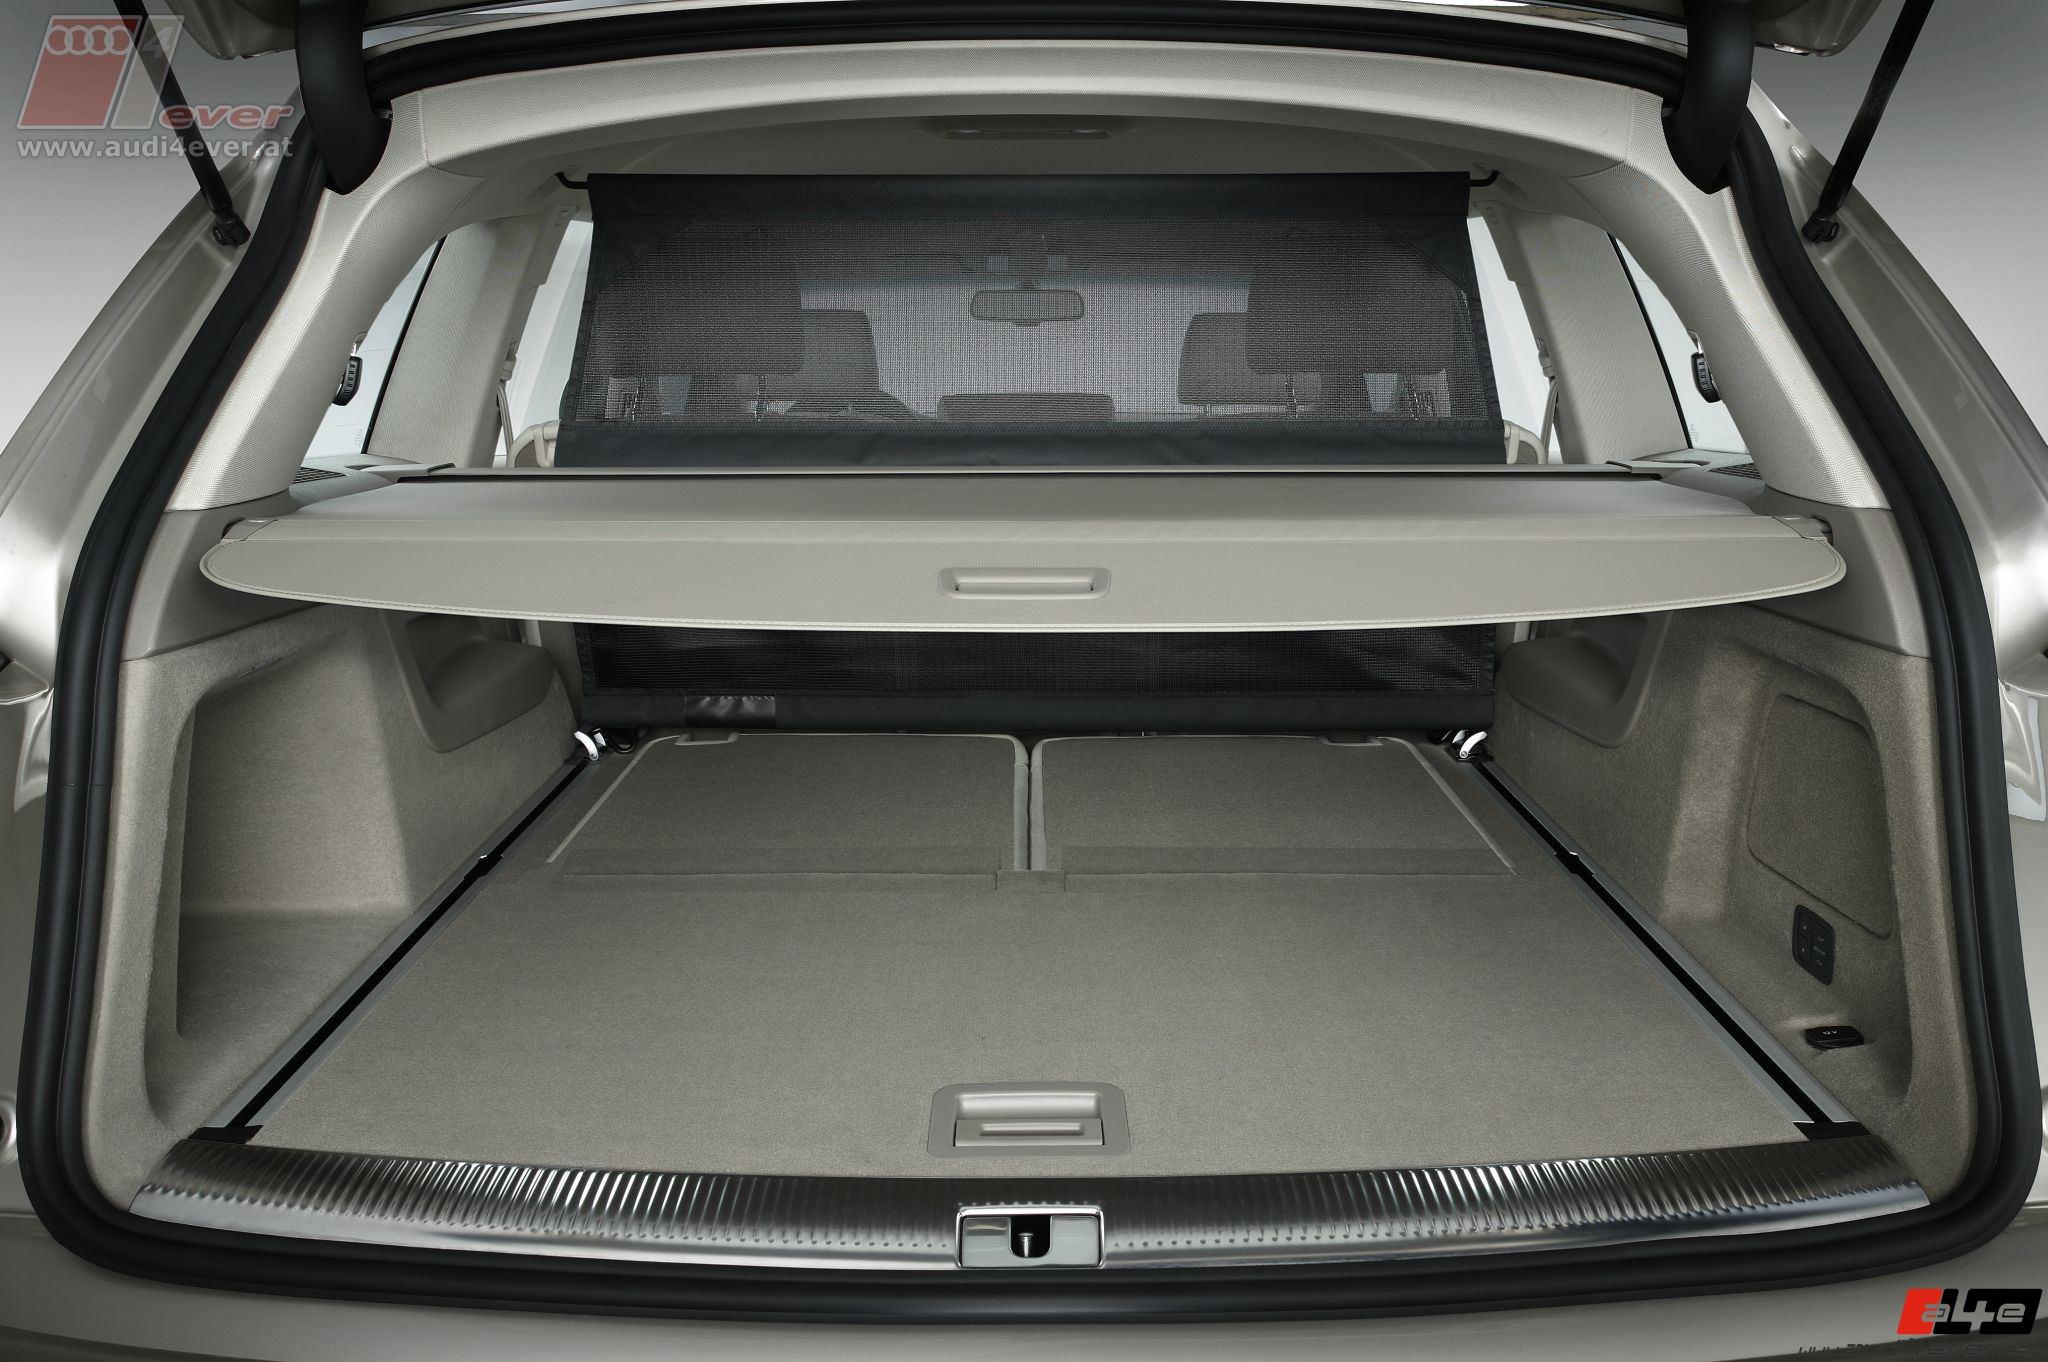 a4e - Gallery Audi Q7 - Audi Q7 - Interieur